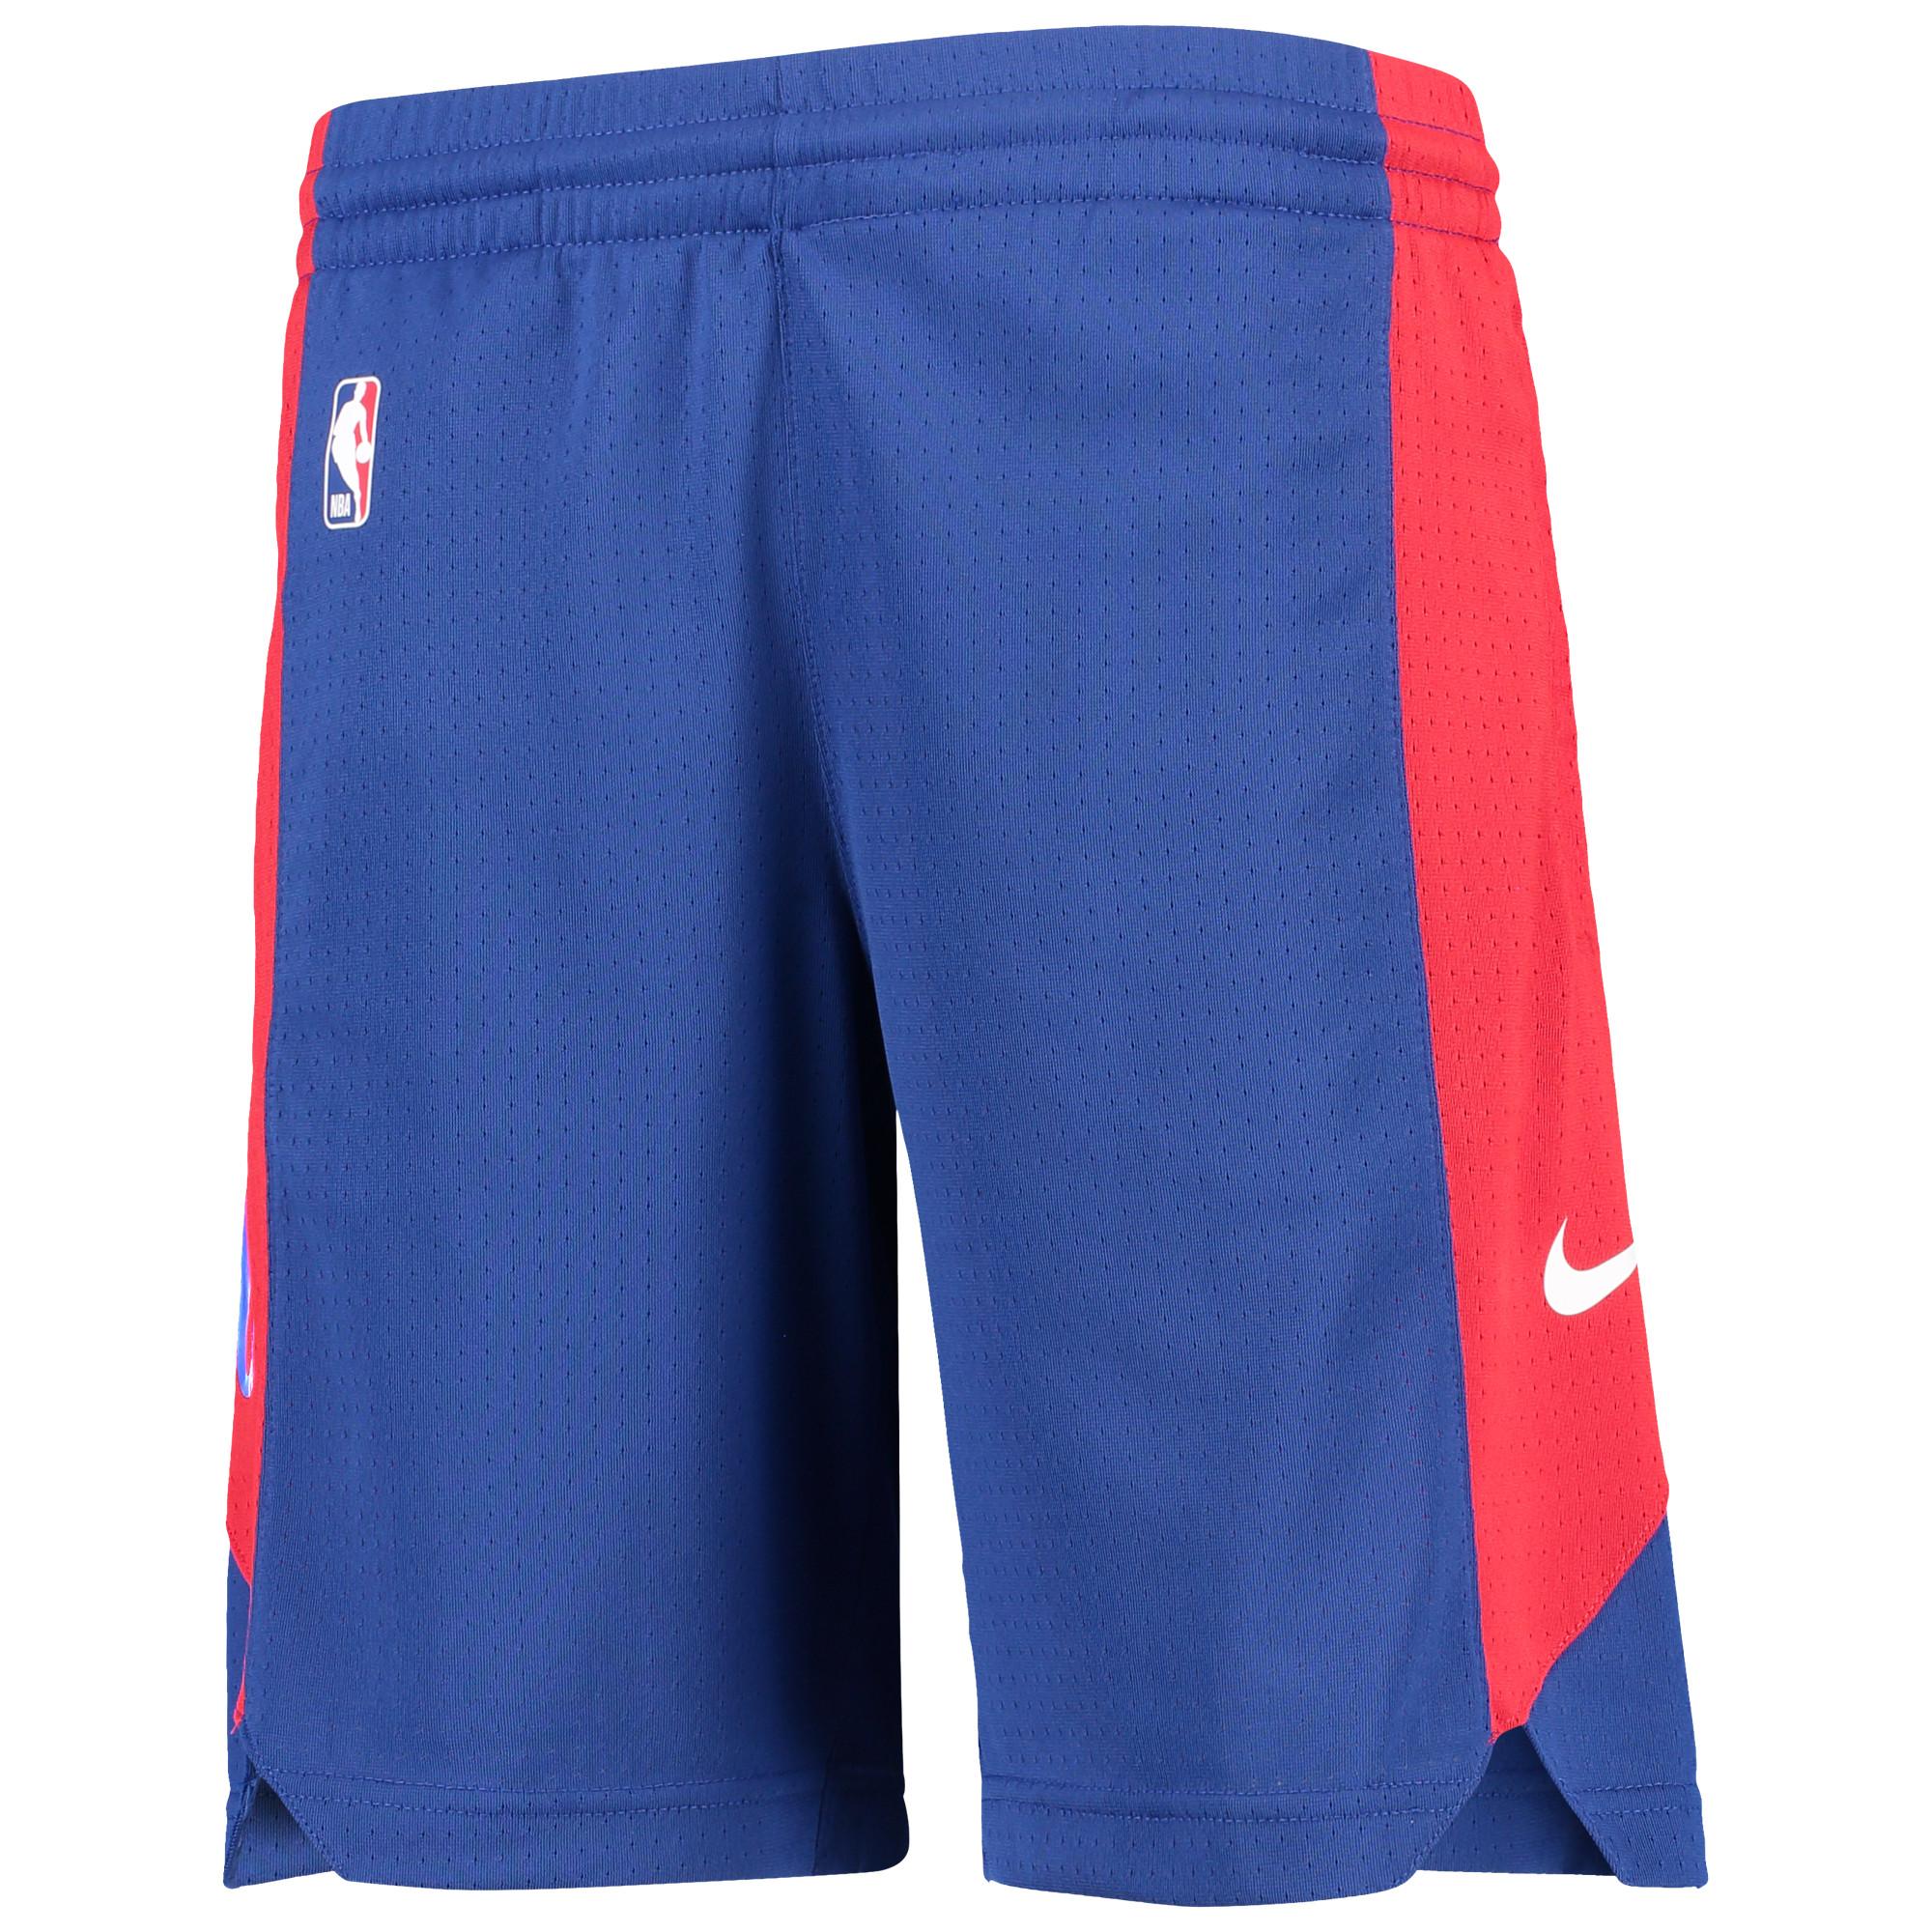 Philadelphia 76ers Nike Youth Performance Practice Shorts - Royal/Red